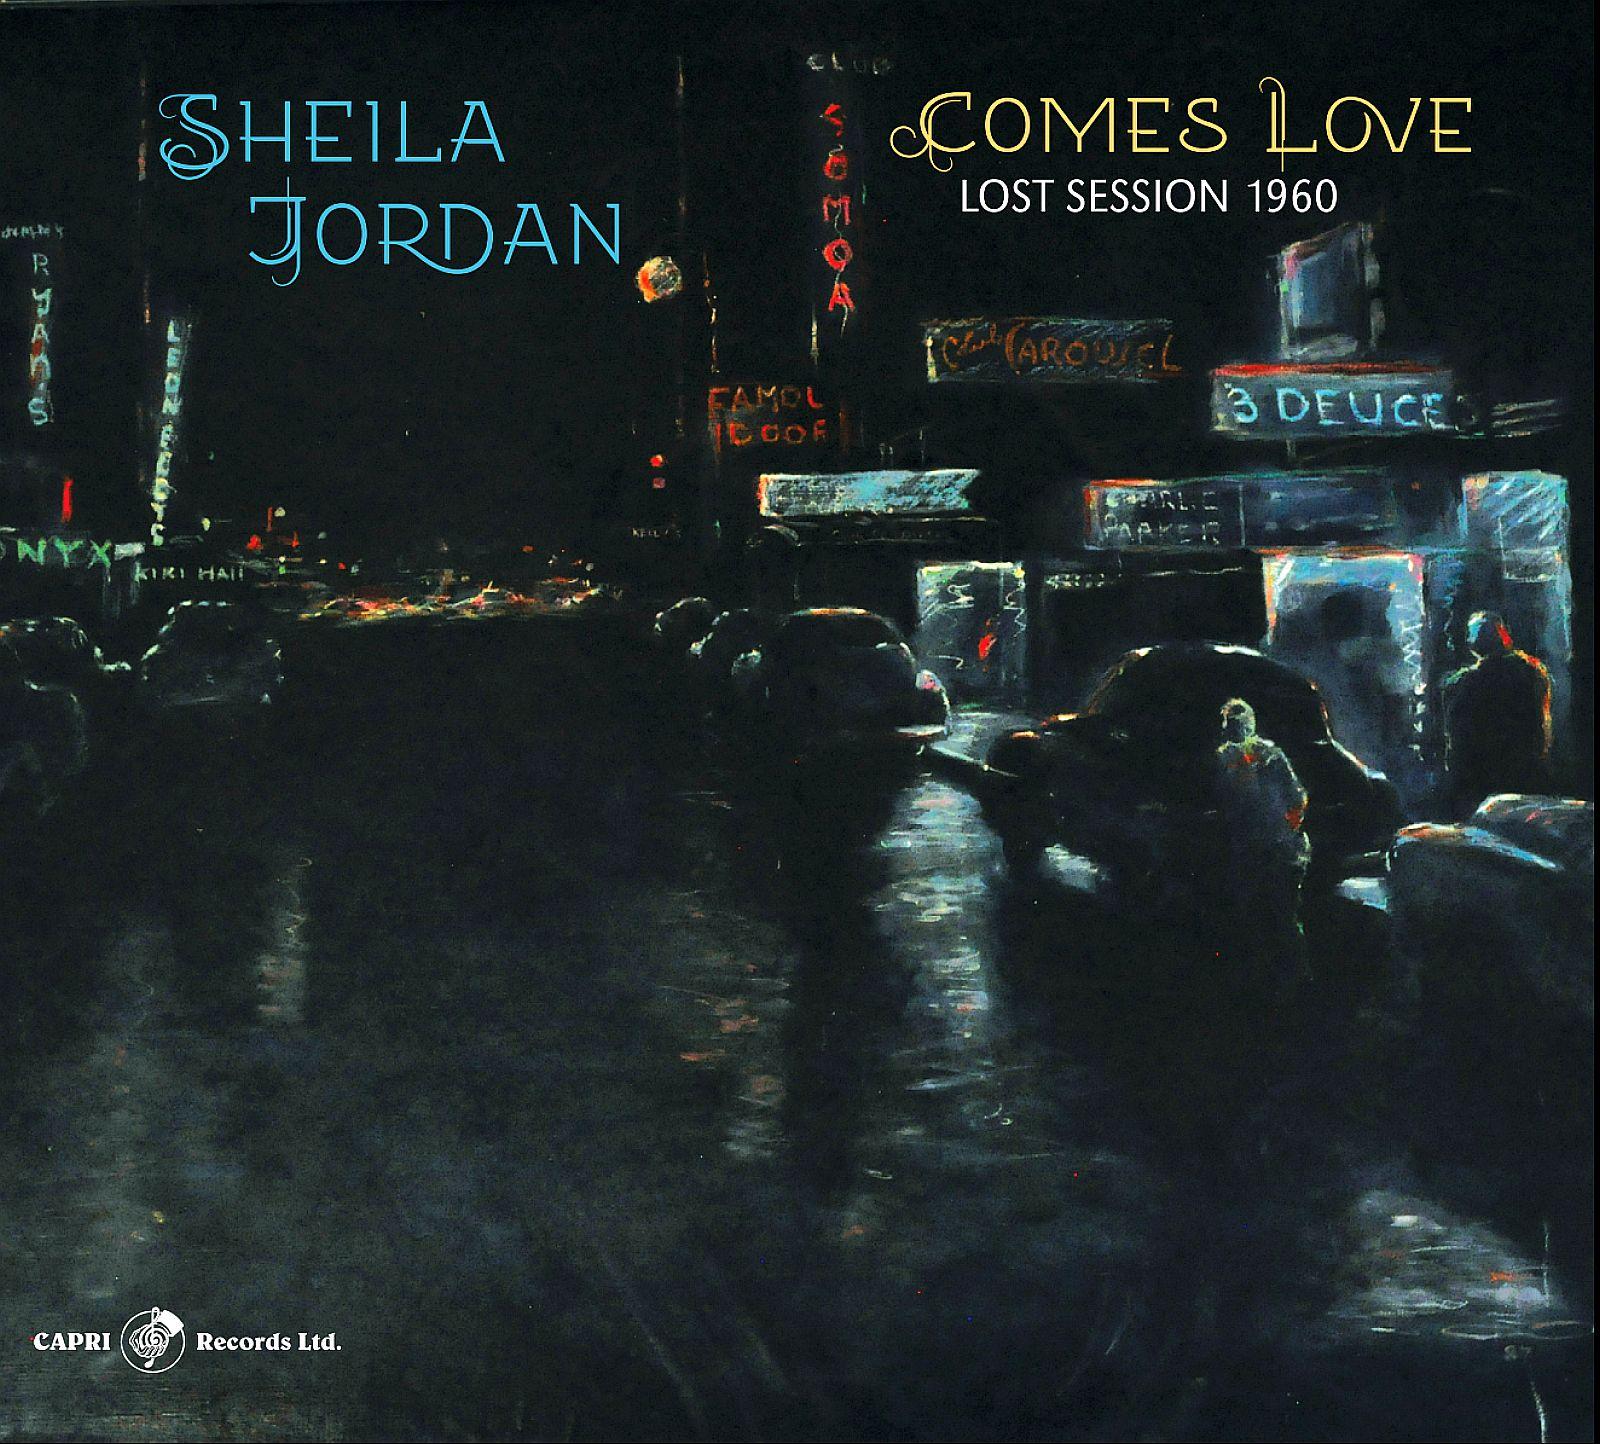 Sheila Jordan - Comes Love _ cover